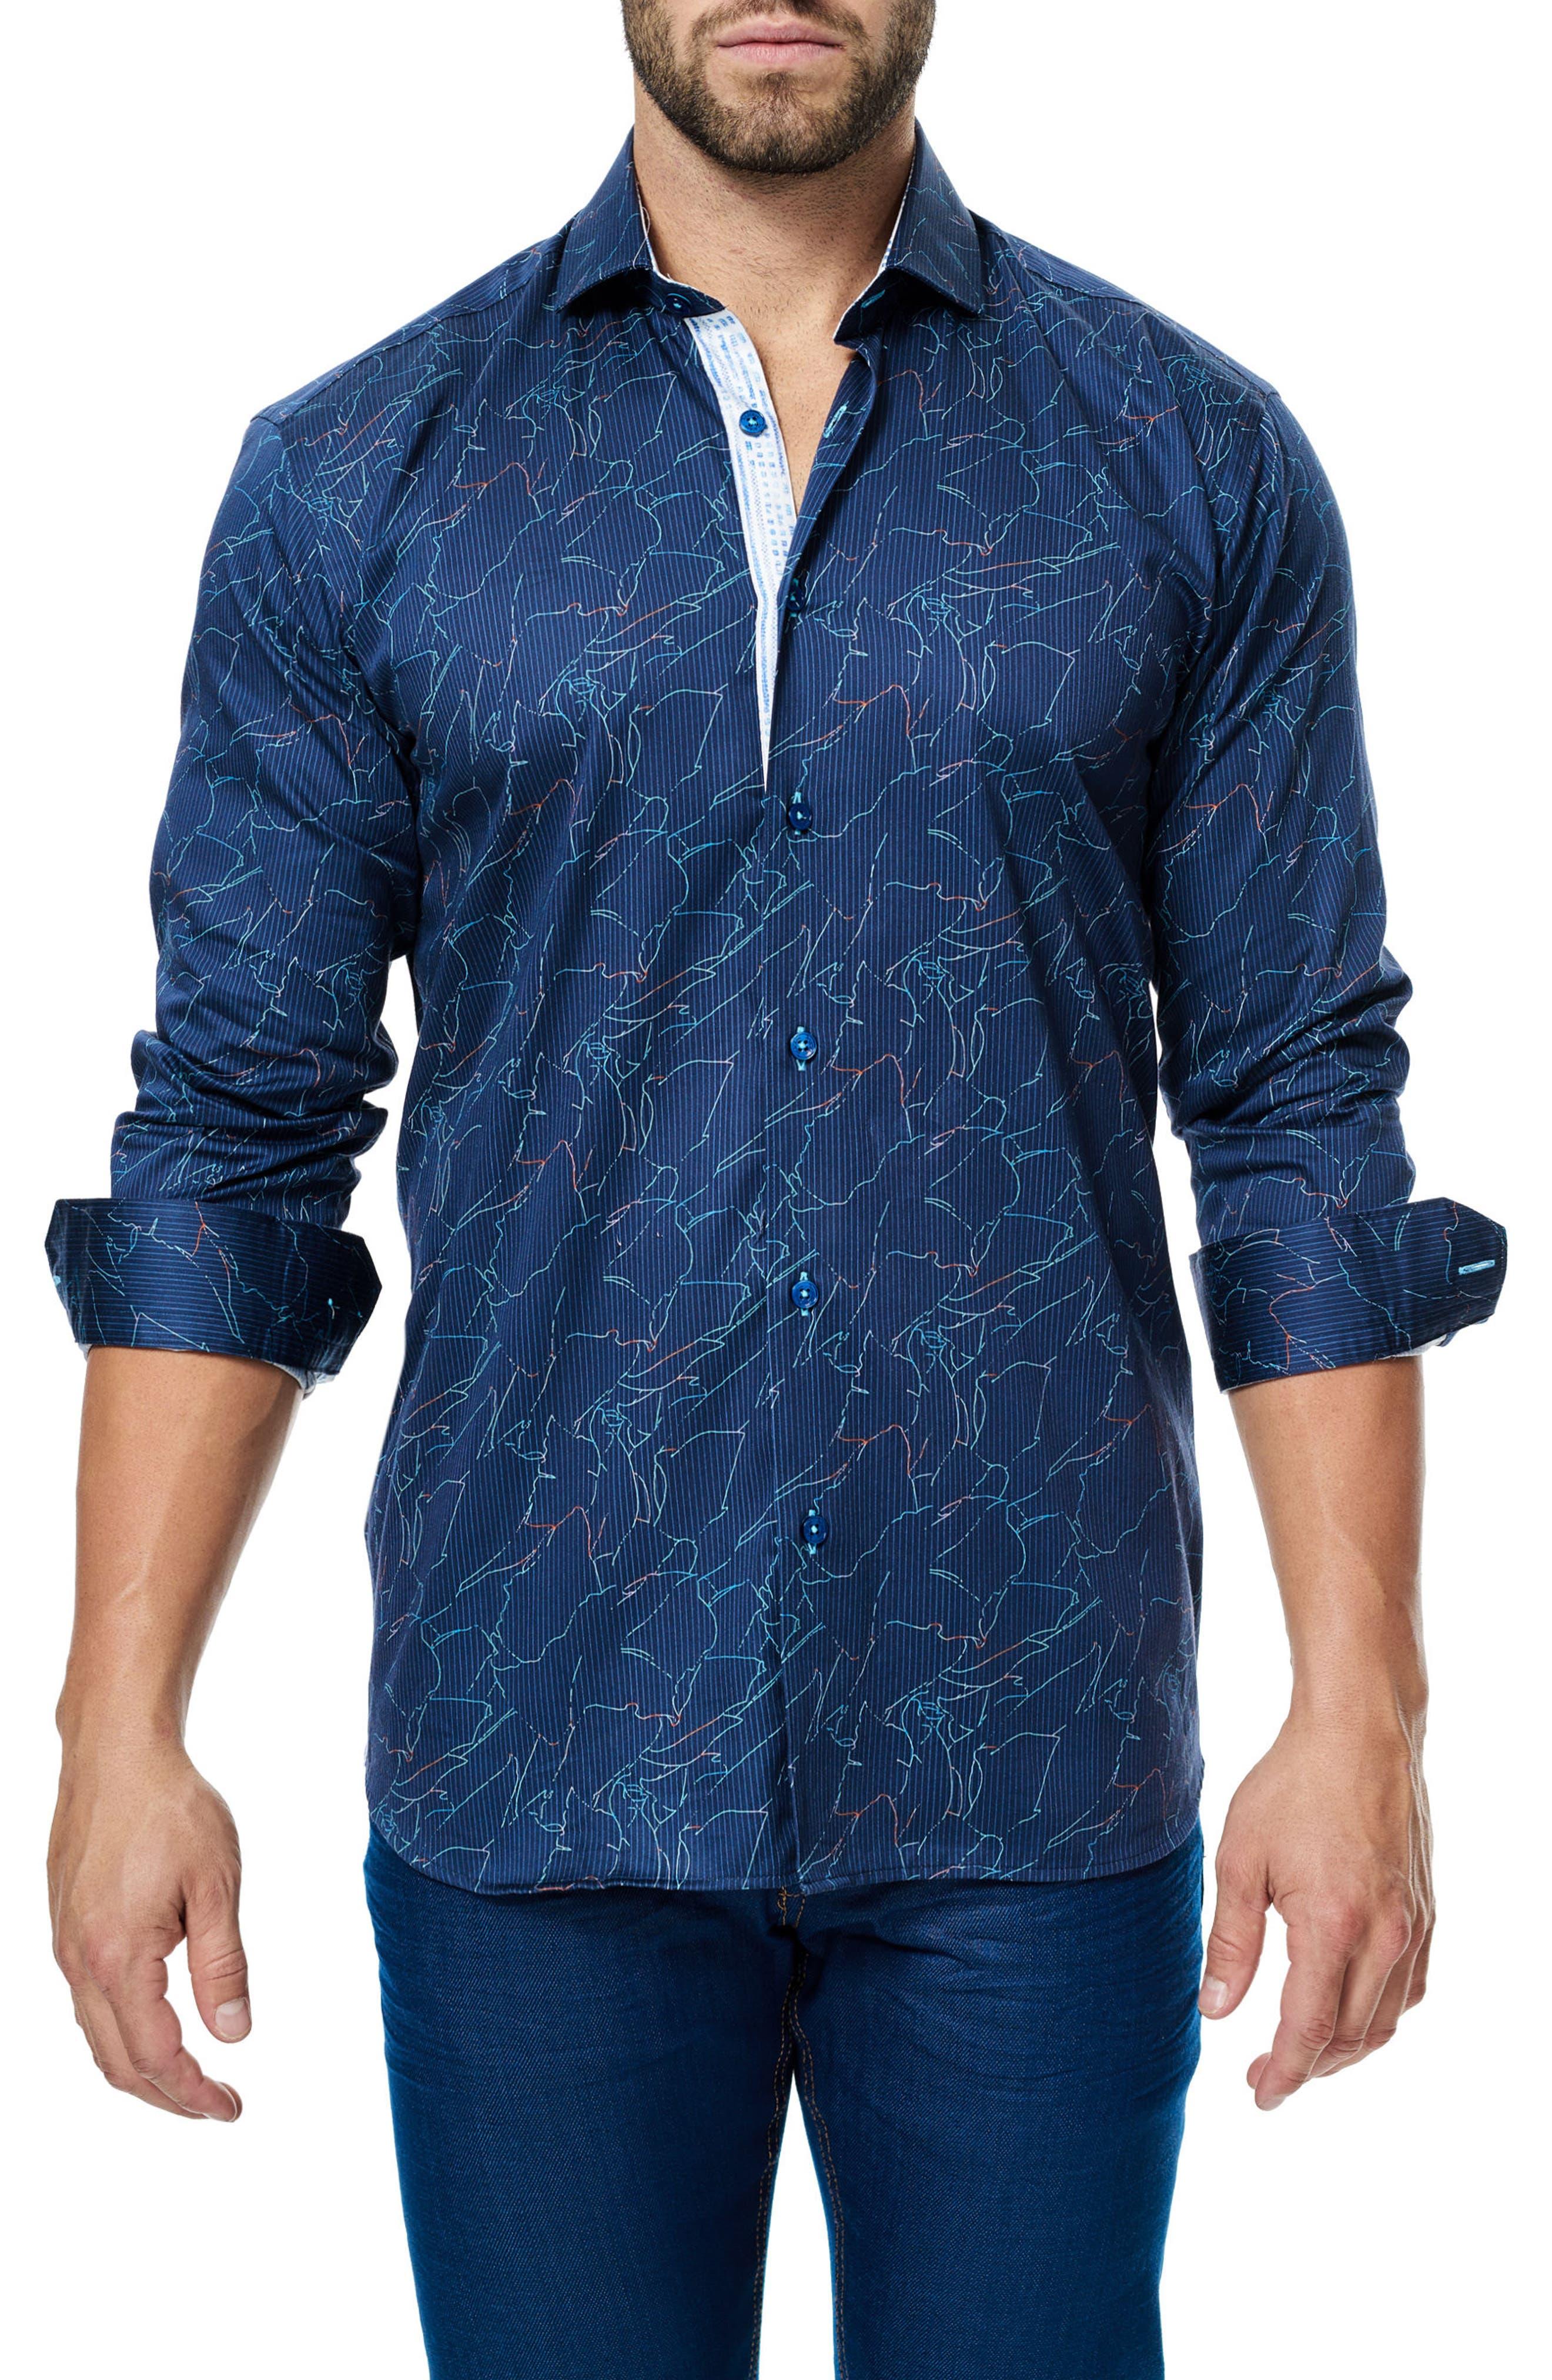 Alternate Image 1 Selected - Maceoo Class Zigzag Print Sport Shirt